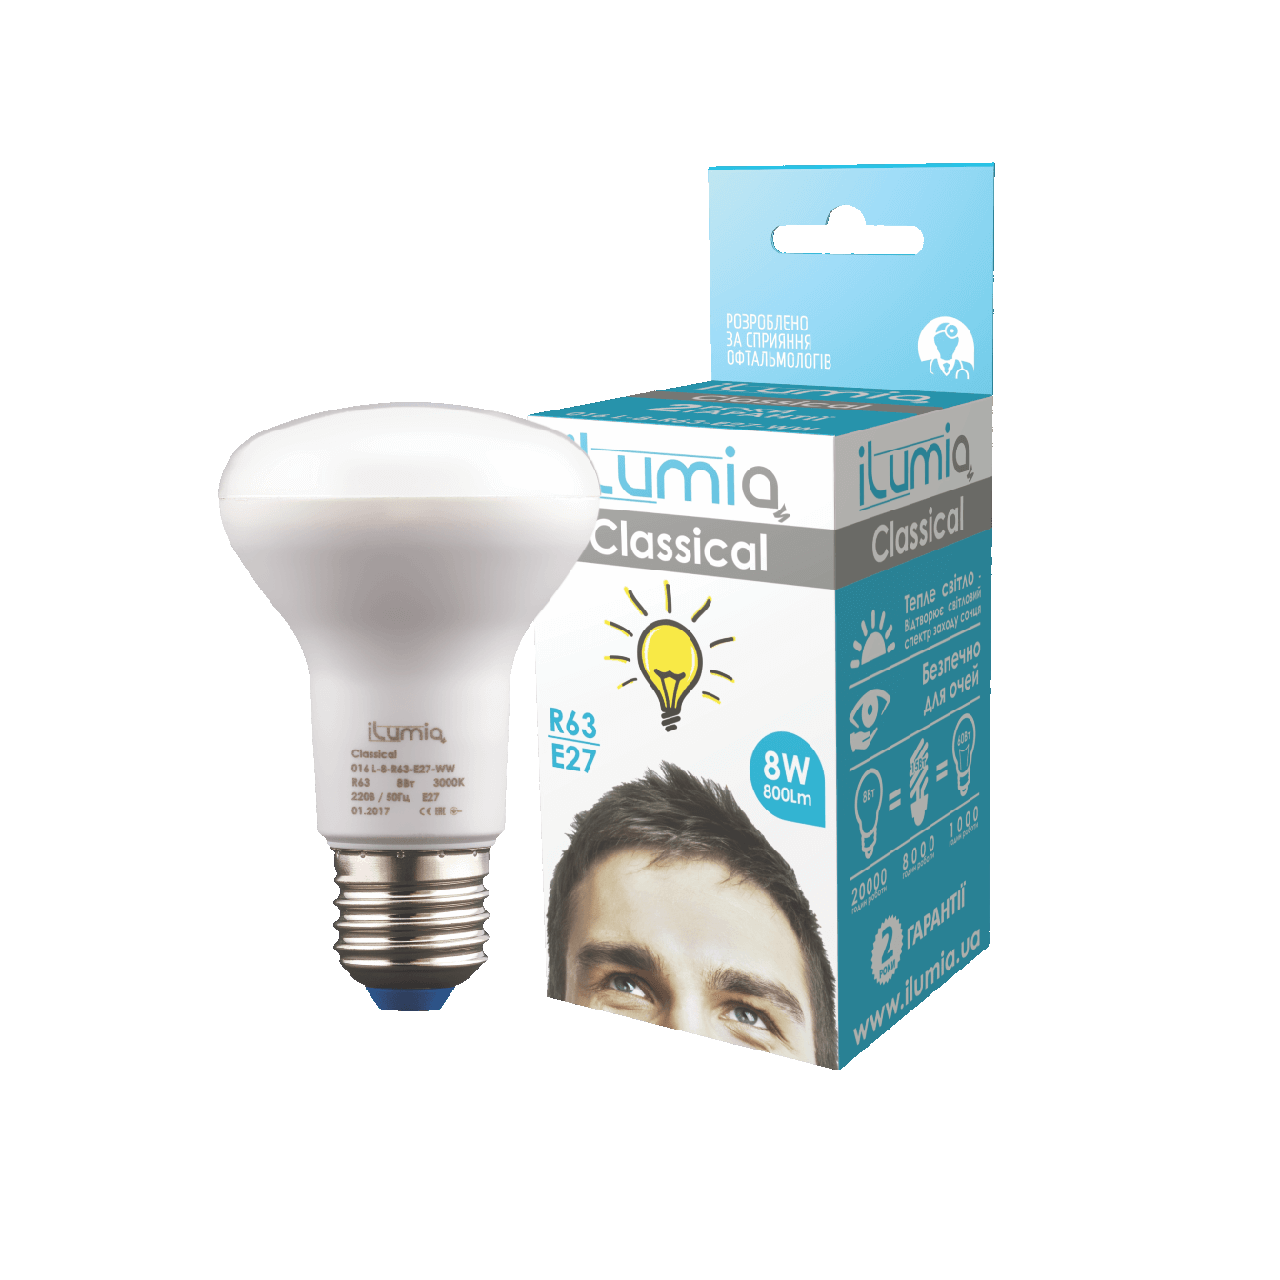 LED лампа Ilumia 8W Е27 R63 3000К теплый 800Lm (016)